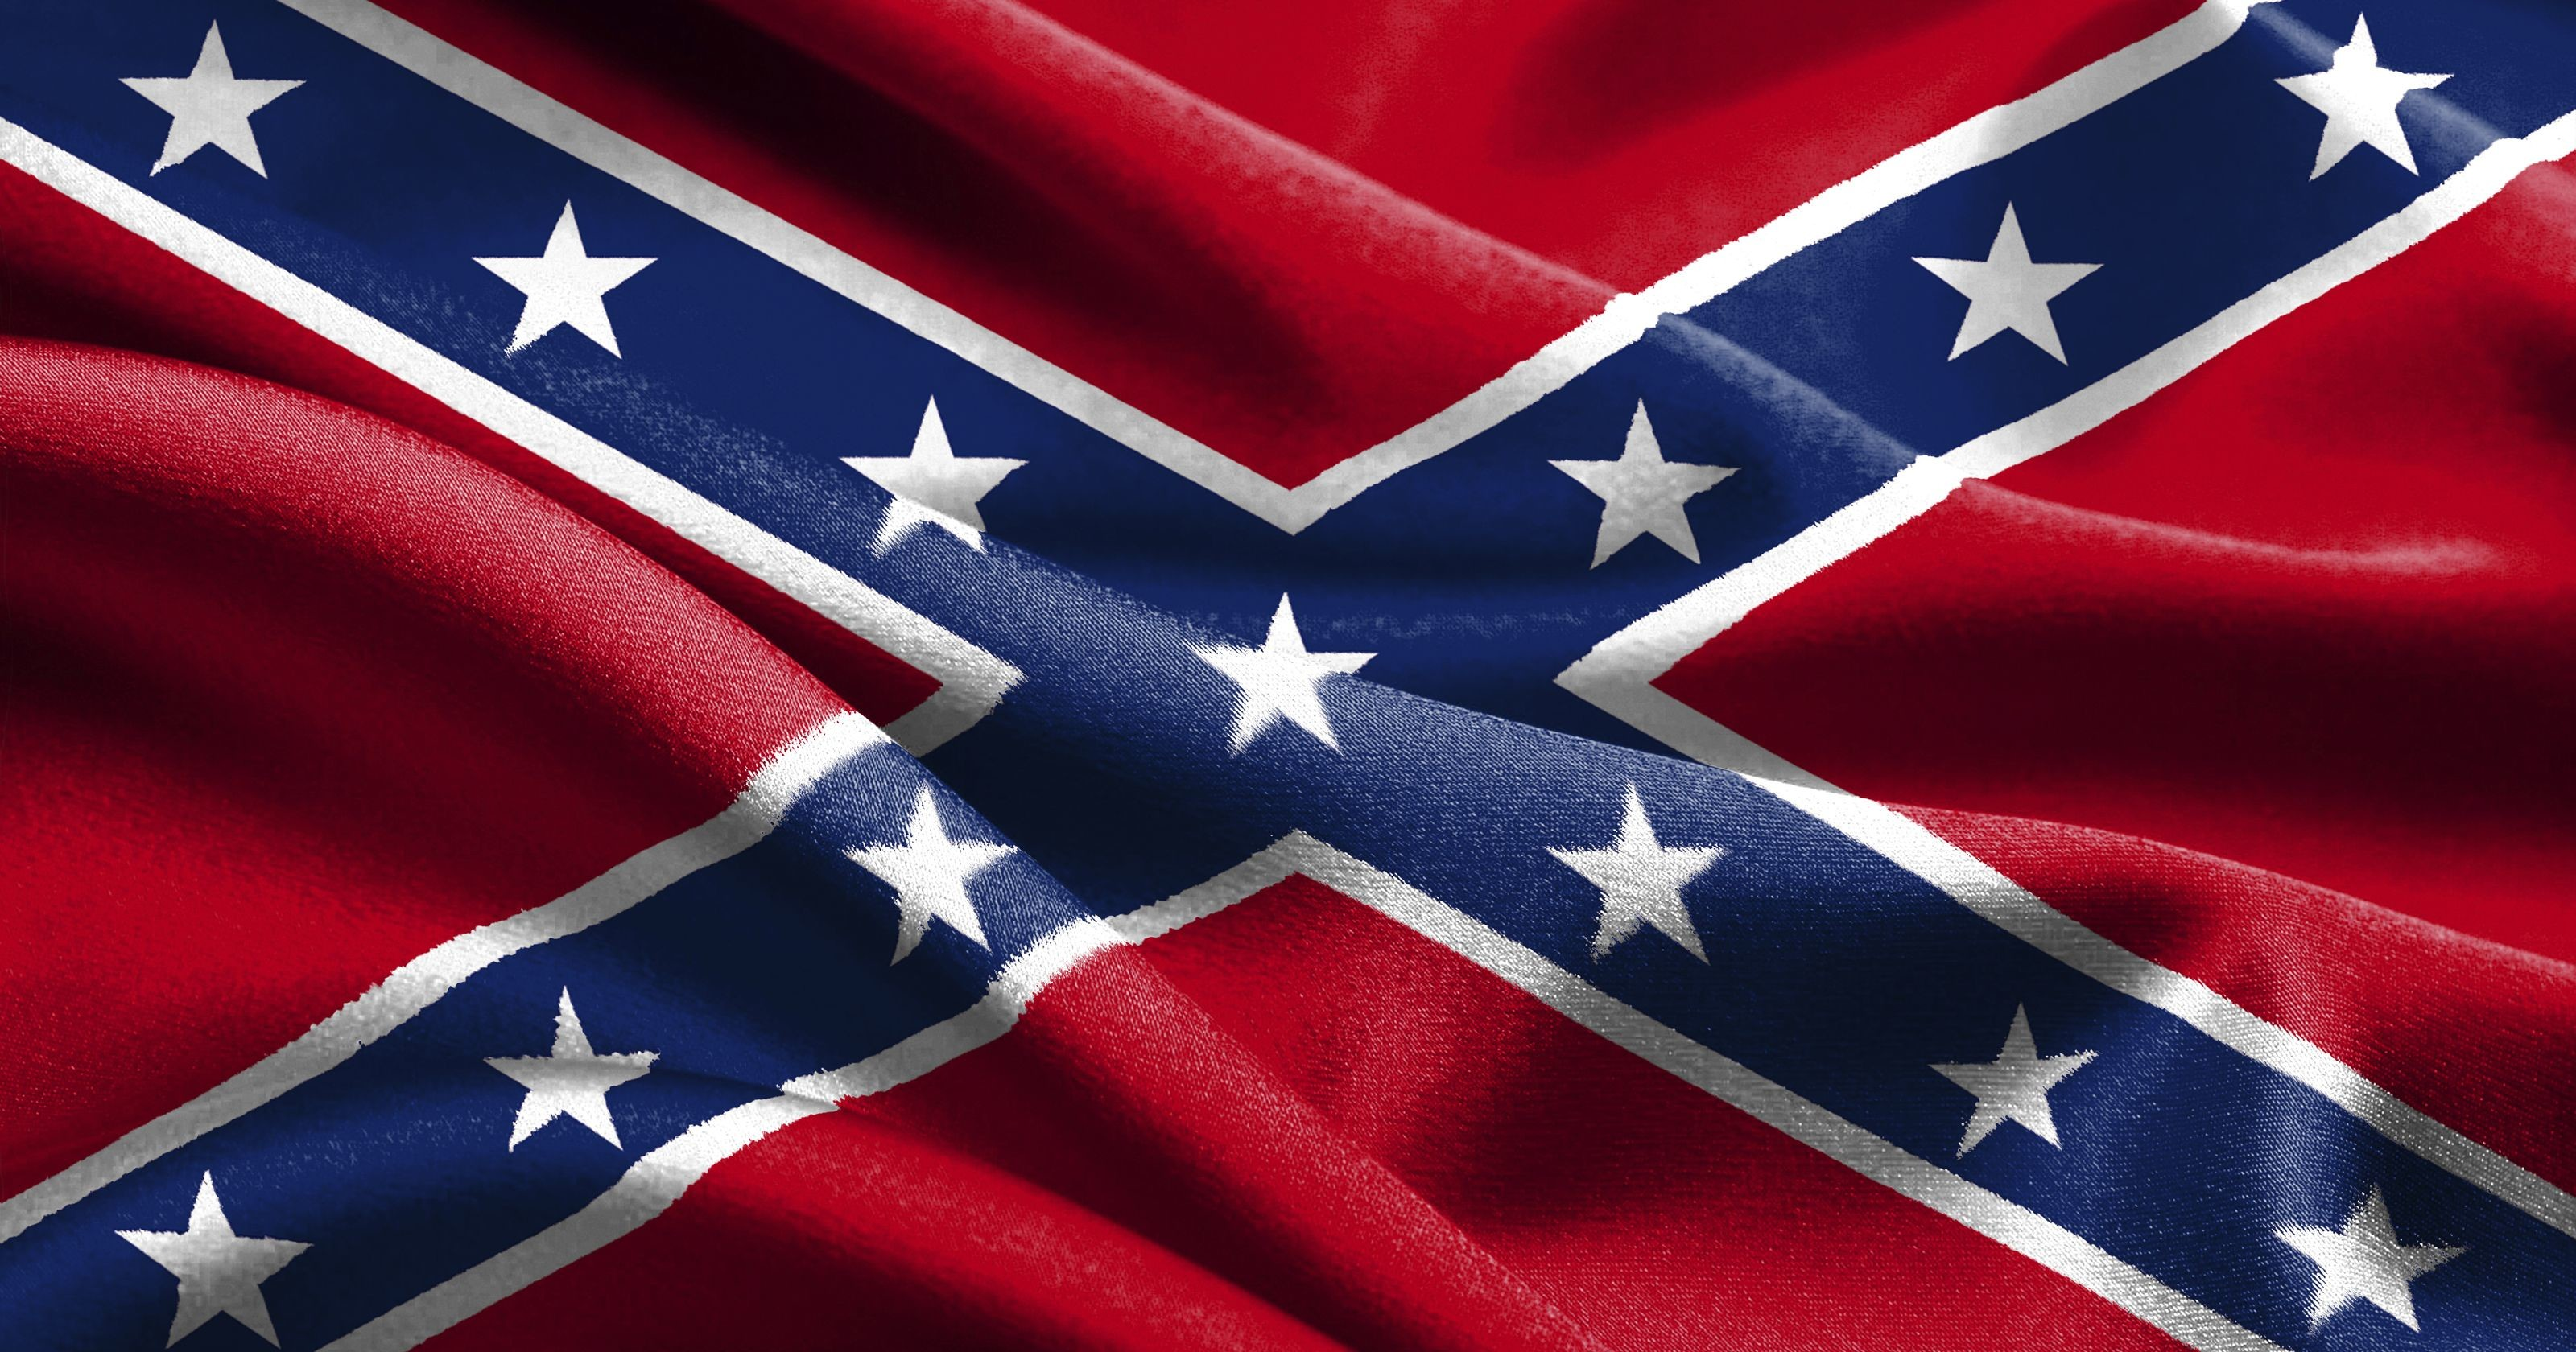 Rebel Flag Backgrounds 52 Pictures